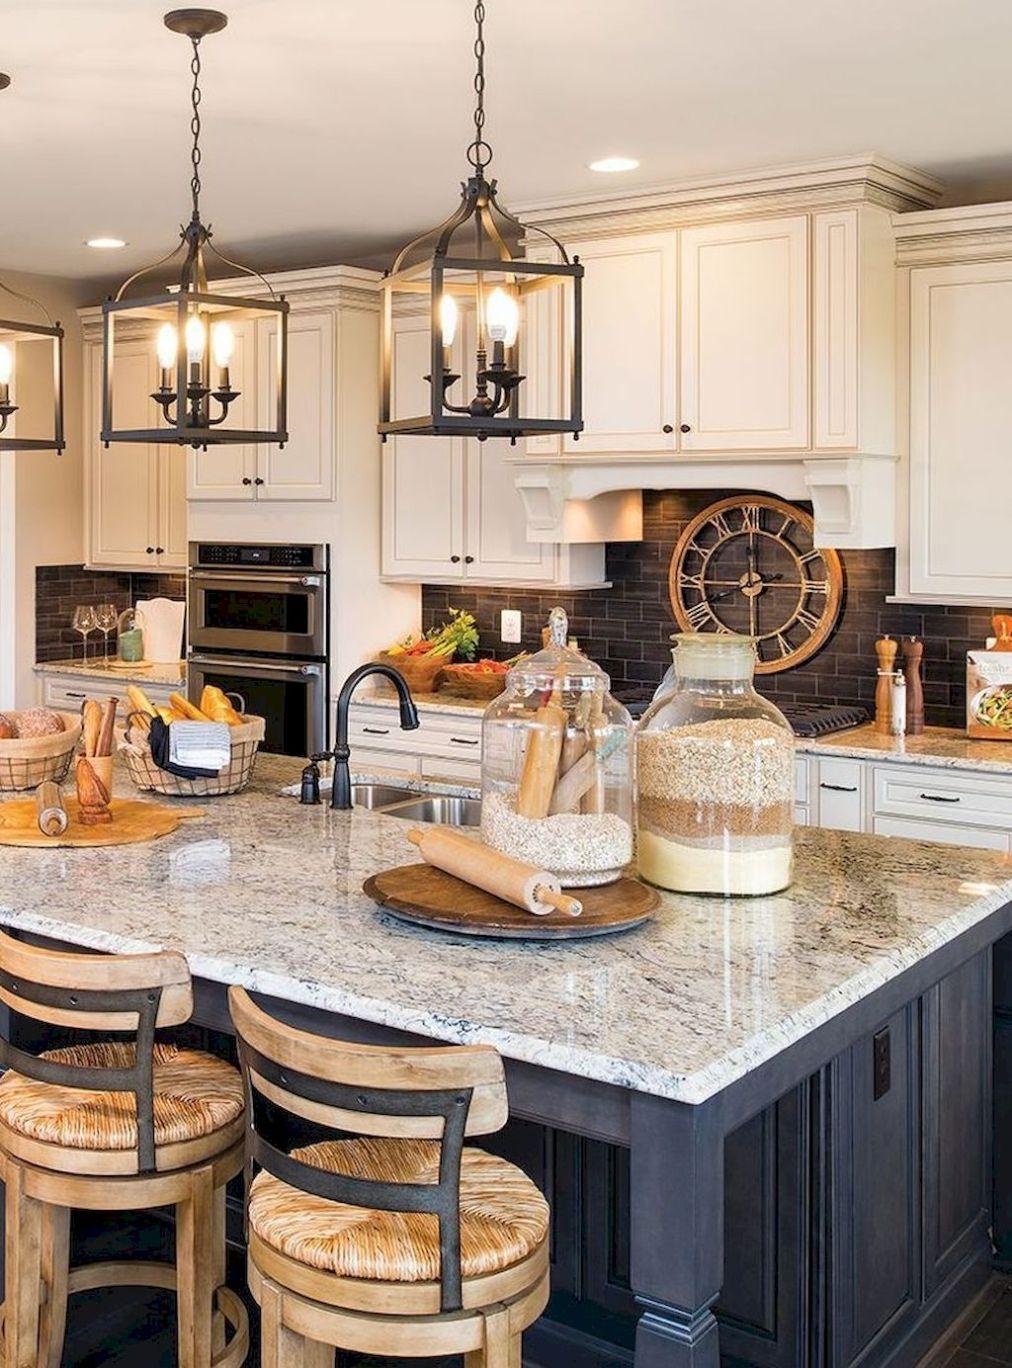 Modern Farmhouse Kitchen Cabinet Ideas 45 Farmhouse Style Kitchen Kitchen Cabinets Decor Rustic Kitchen